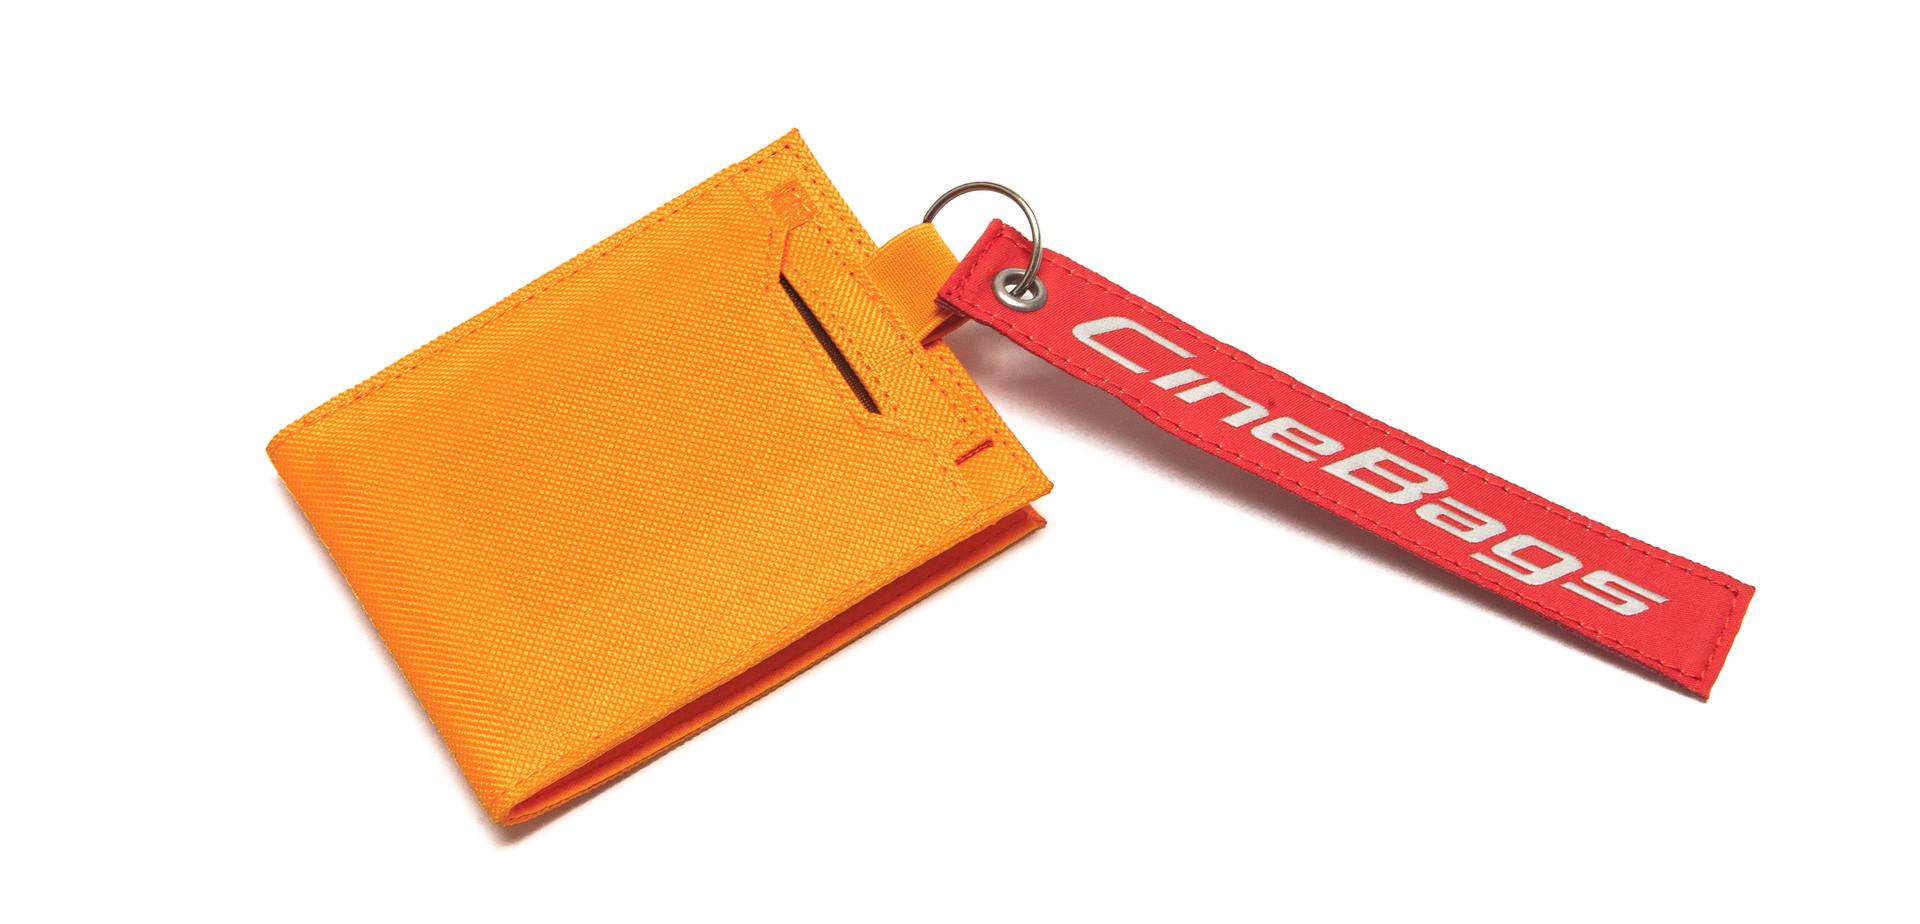 CineBags CB16 Wallet Ornage-2.jpg